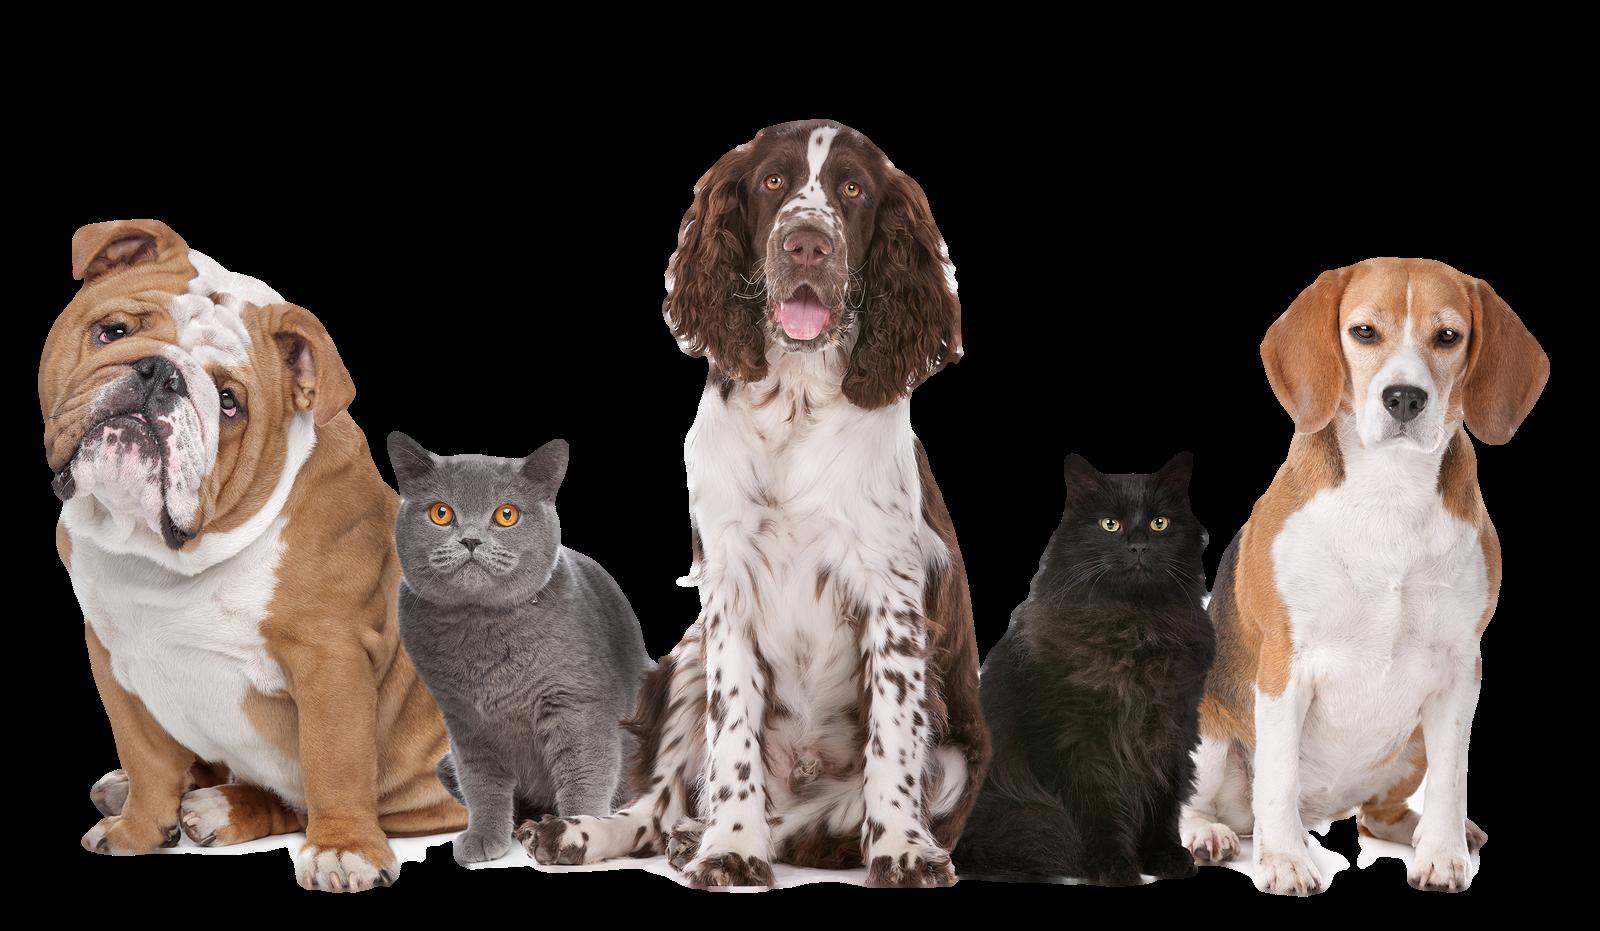 Dog cat clipart png transparent vector free library Cats And Dogs PNG HD Transparent Cats And Dogs HD.PNG Images. | PlusPNG vector free library